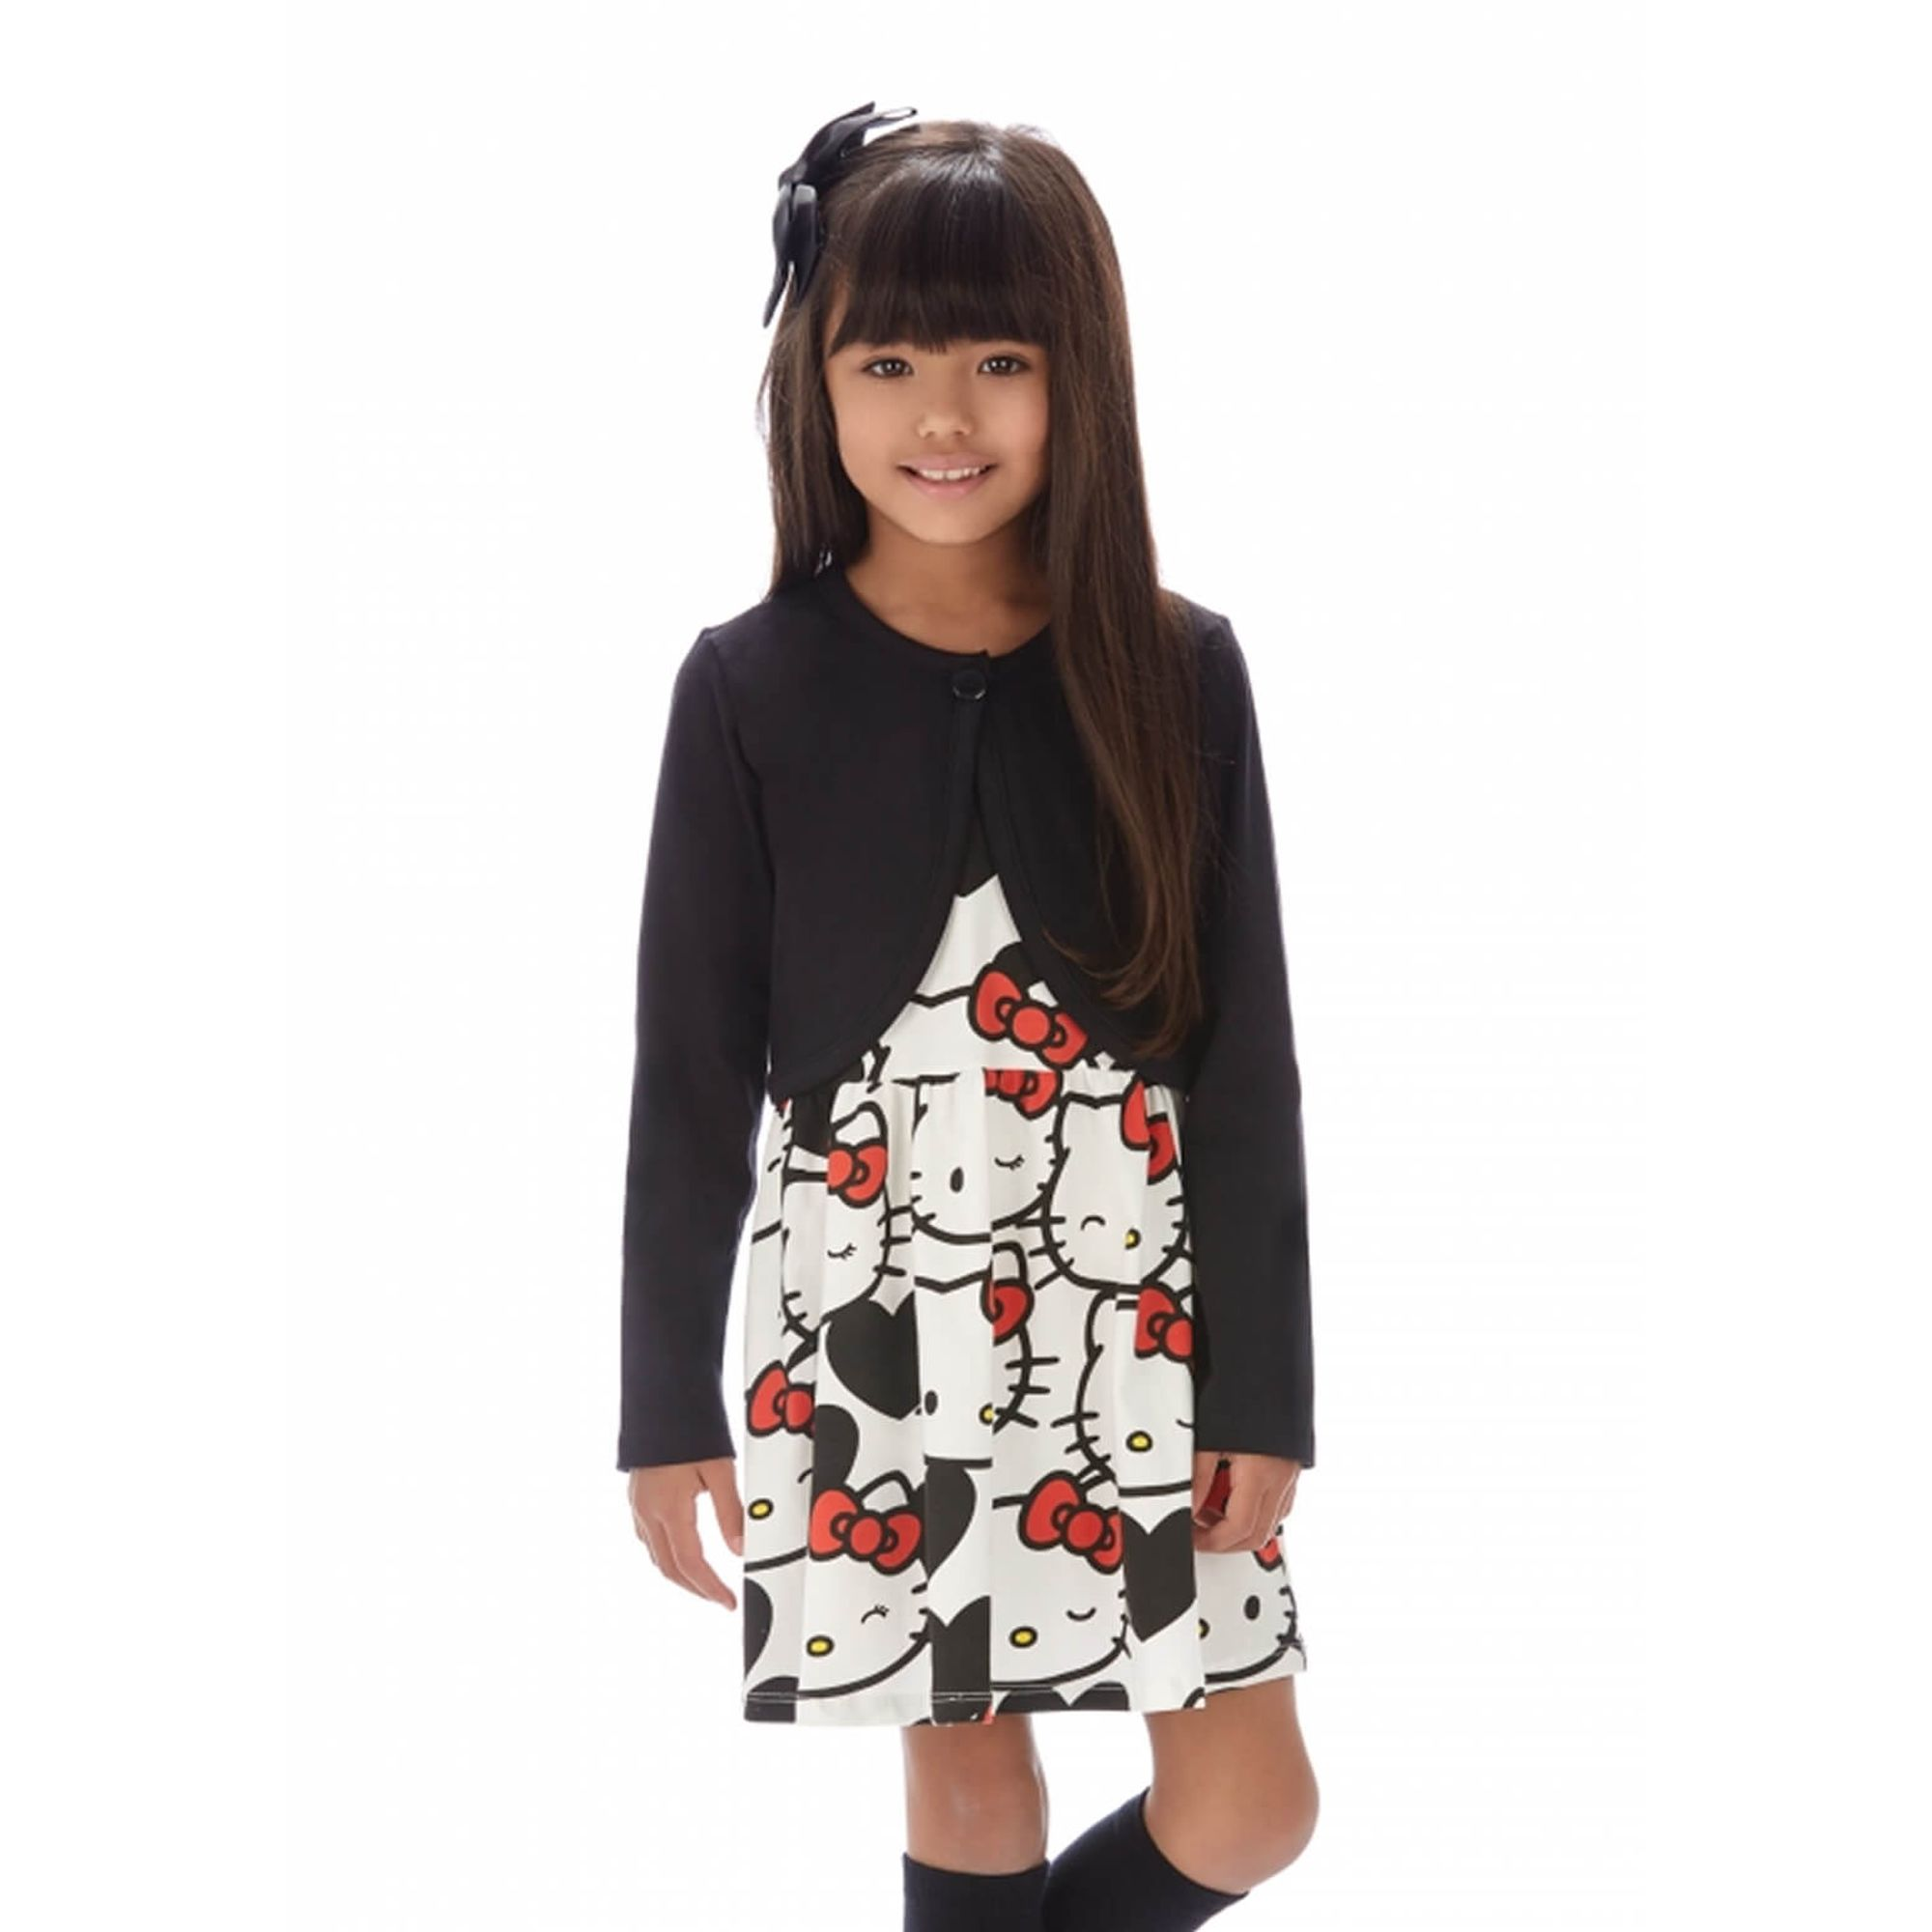 vestido-menina-hello-kitty-e-bolero-preto-em-cotton